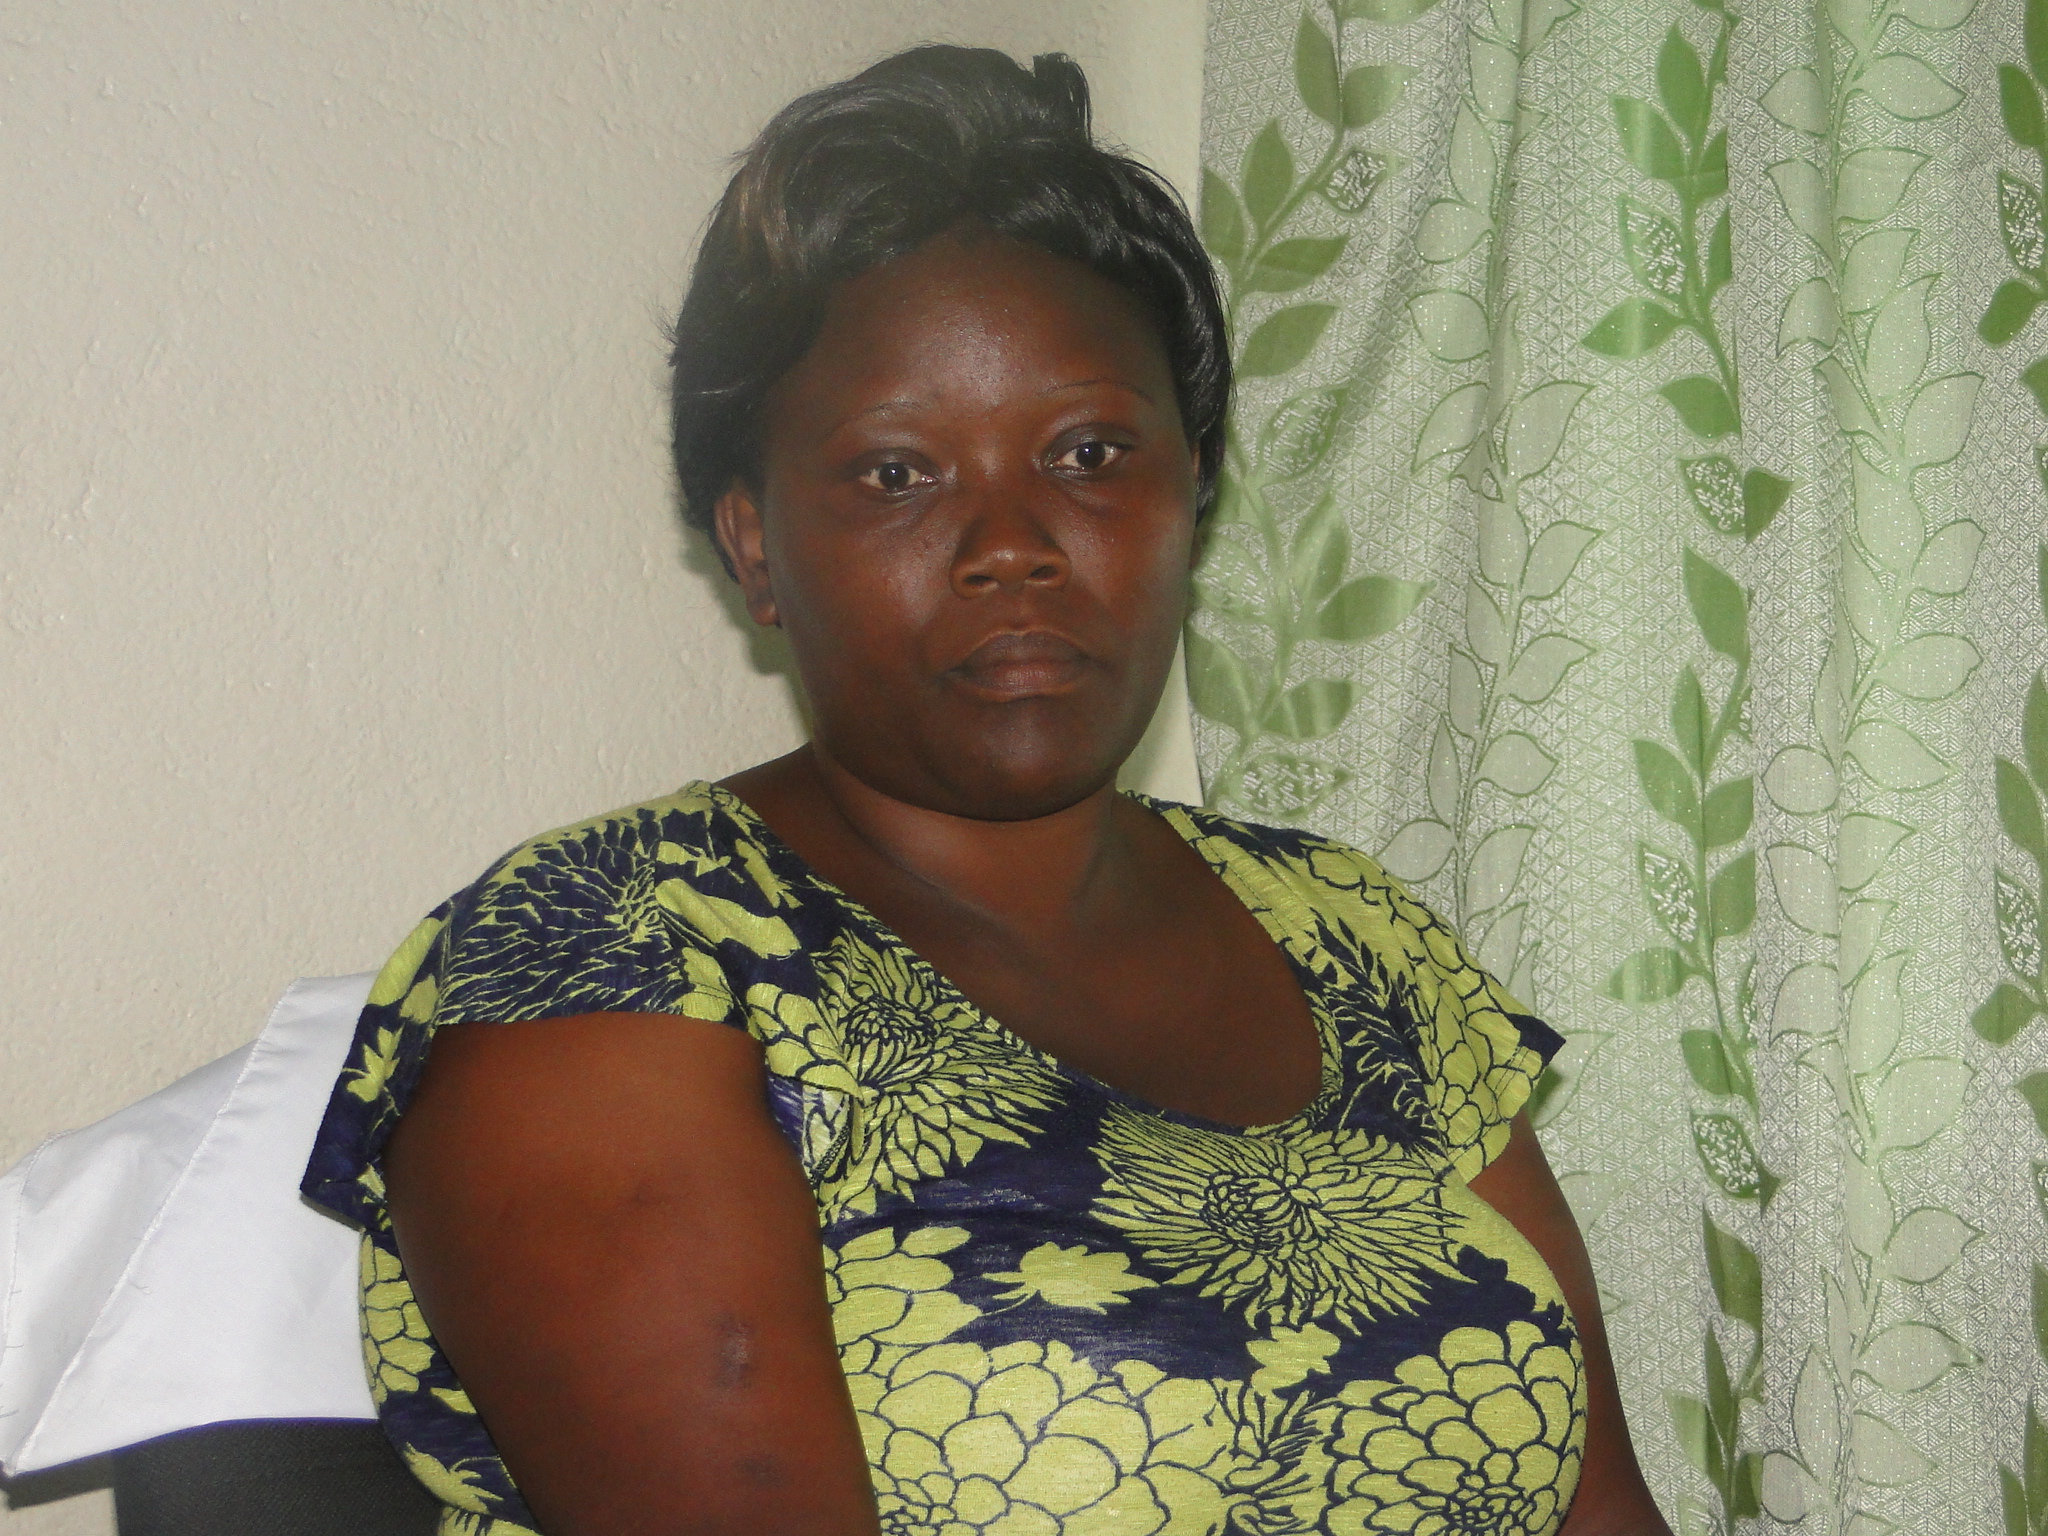 Dorice Moseti, a resident of Mukuru slums and a member of Muungano wa Wanavijiji